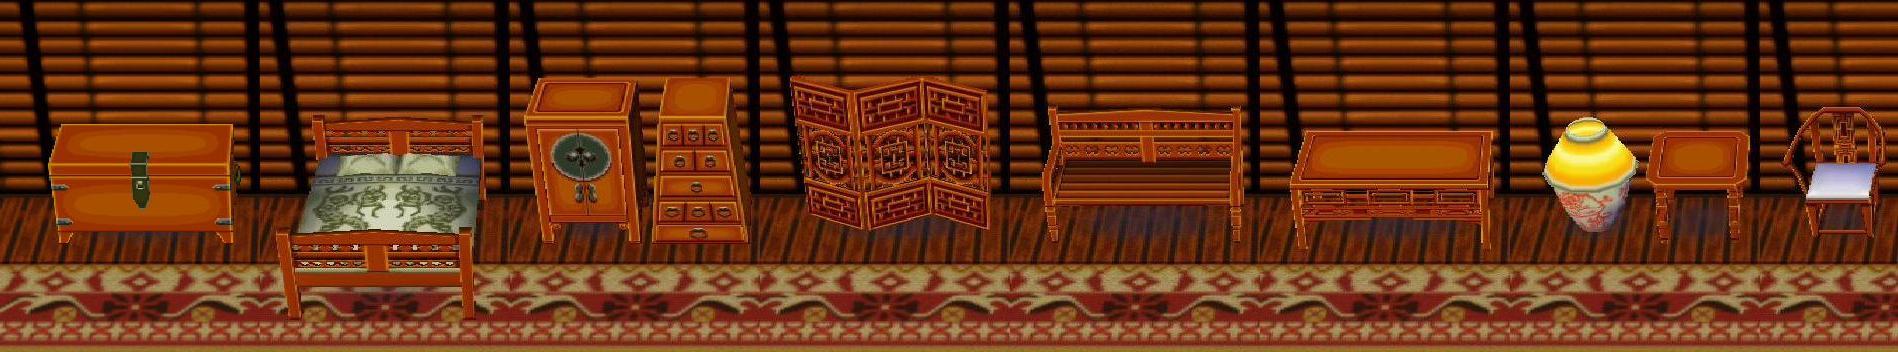 Amazing Category:Furniture Series | Animal Crossing Wiki | FANDOM Powered By Wikia